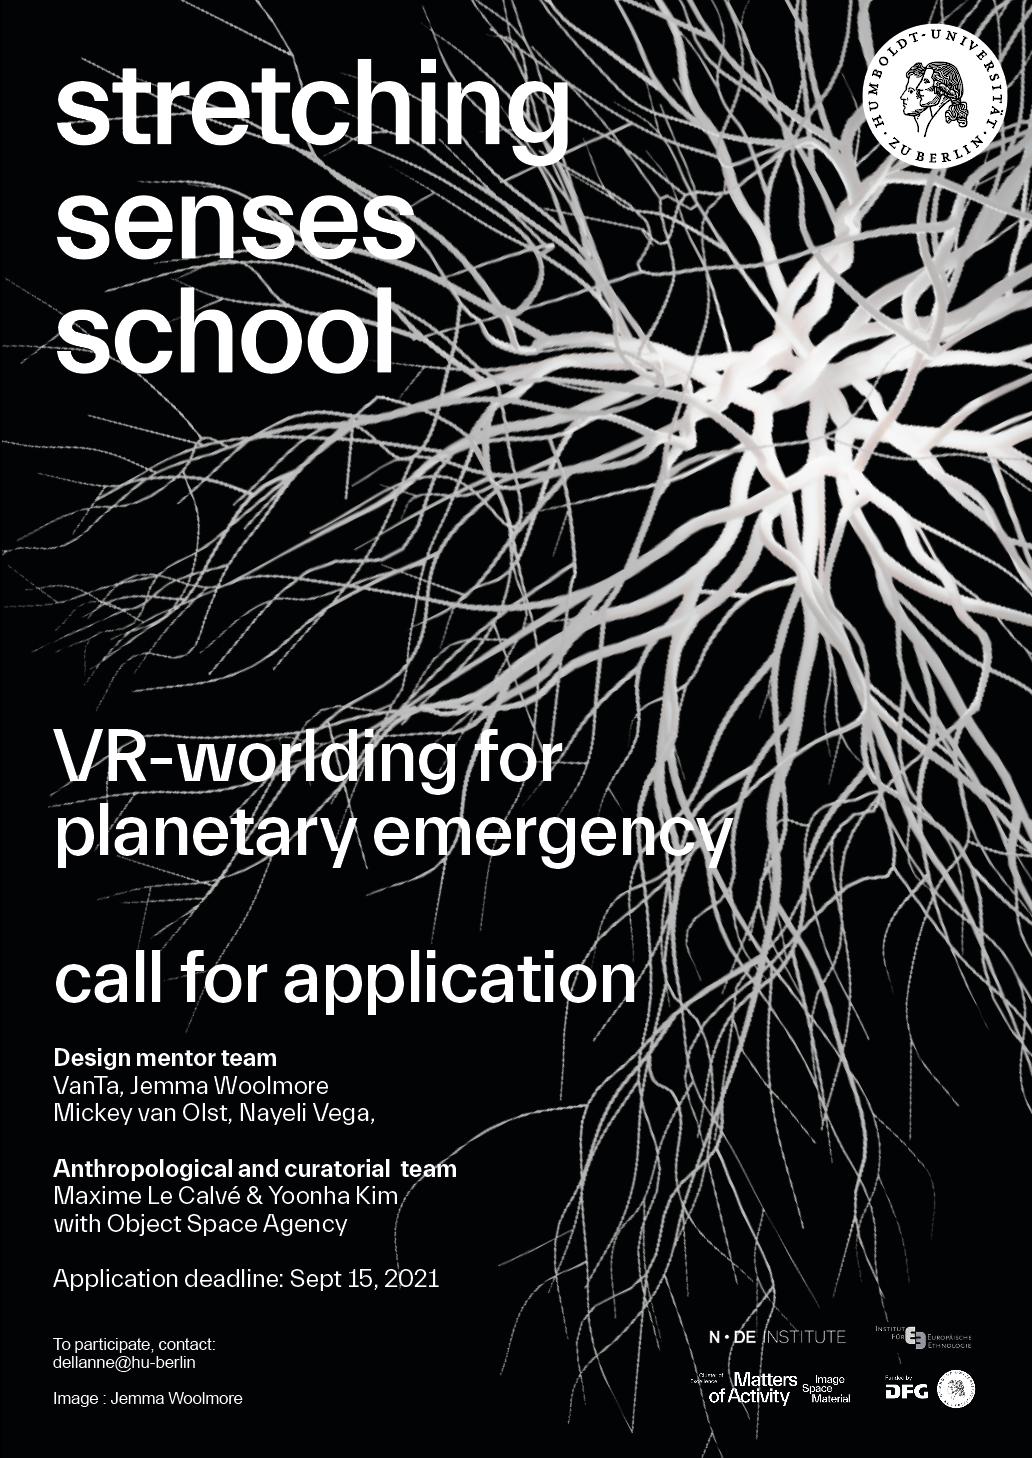 stretching senses school poster